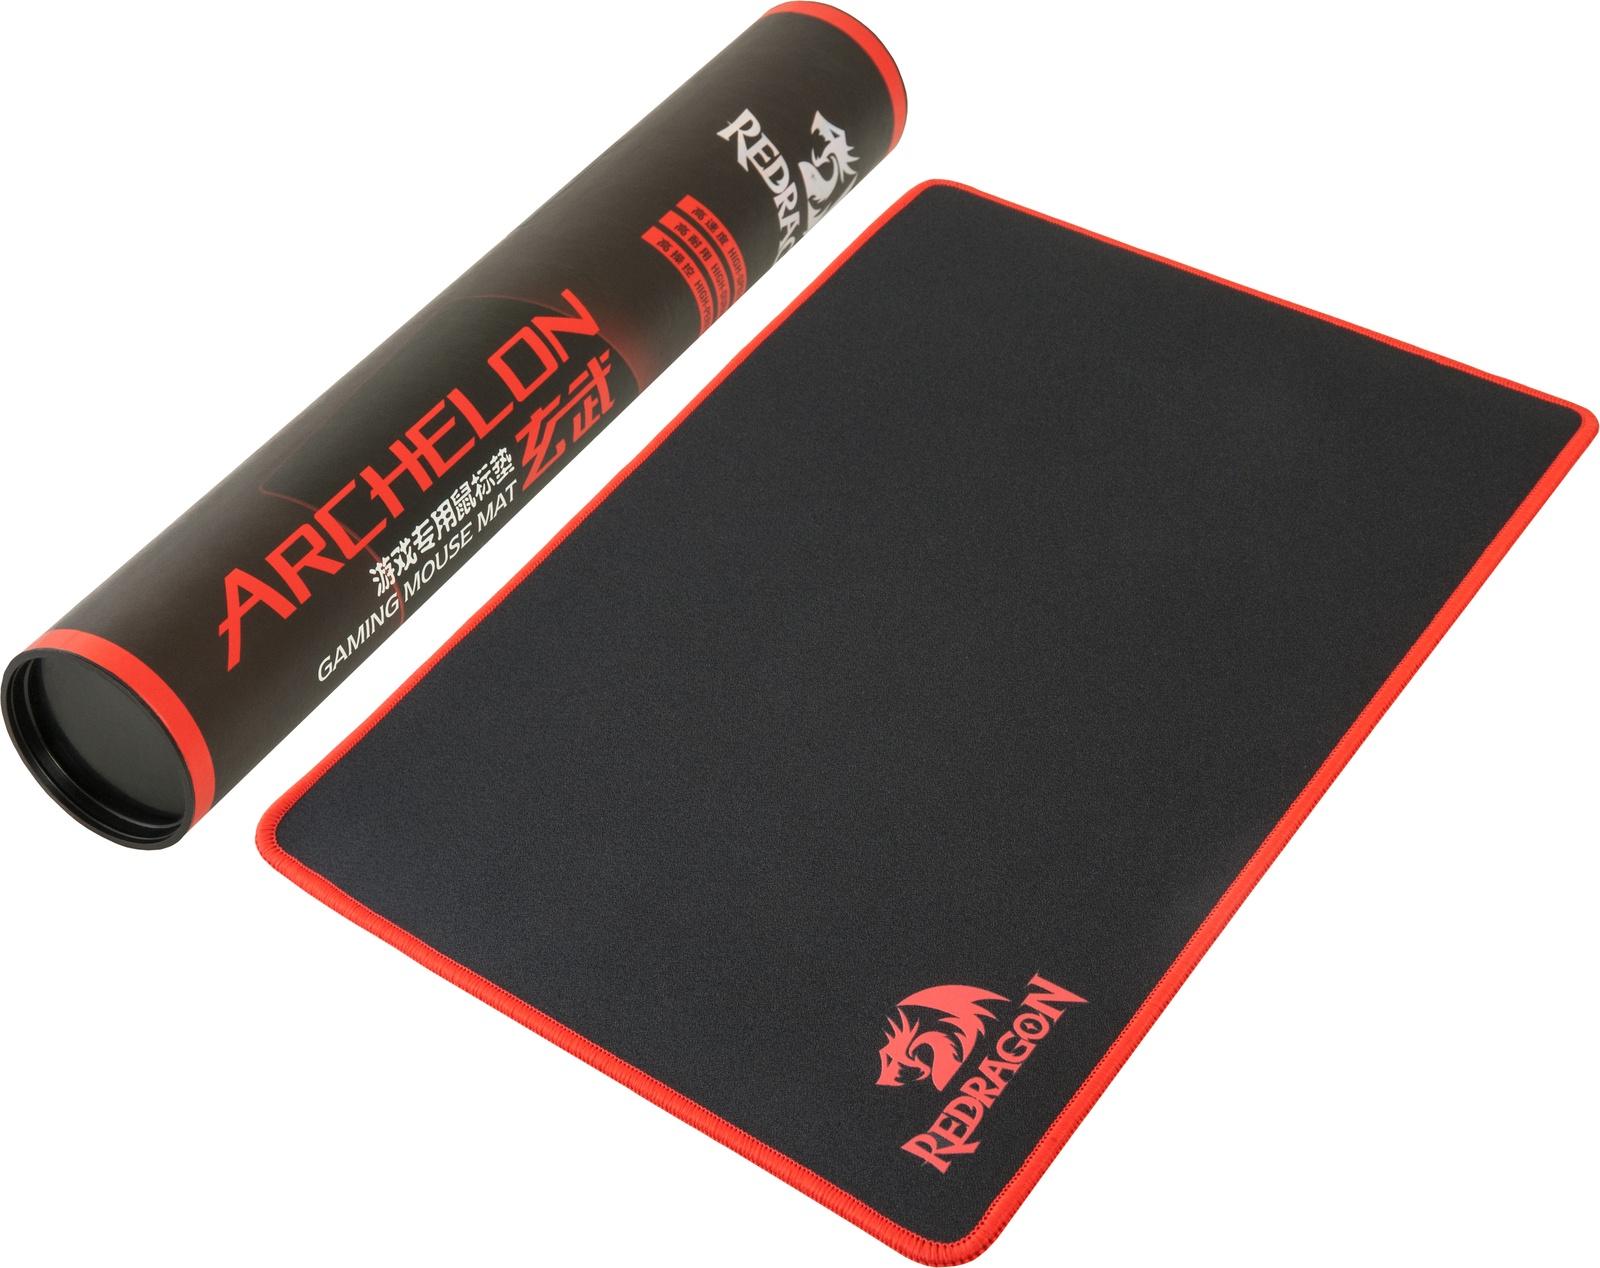 Игровой коврик для мыши Redragon Archelon L 400х300х3 мм, ткань+резина, 70338, черный